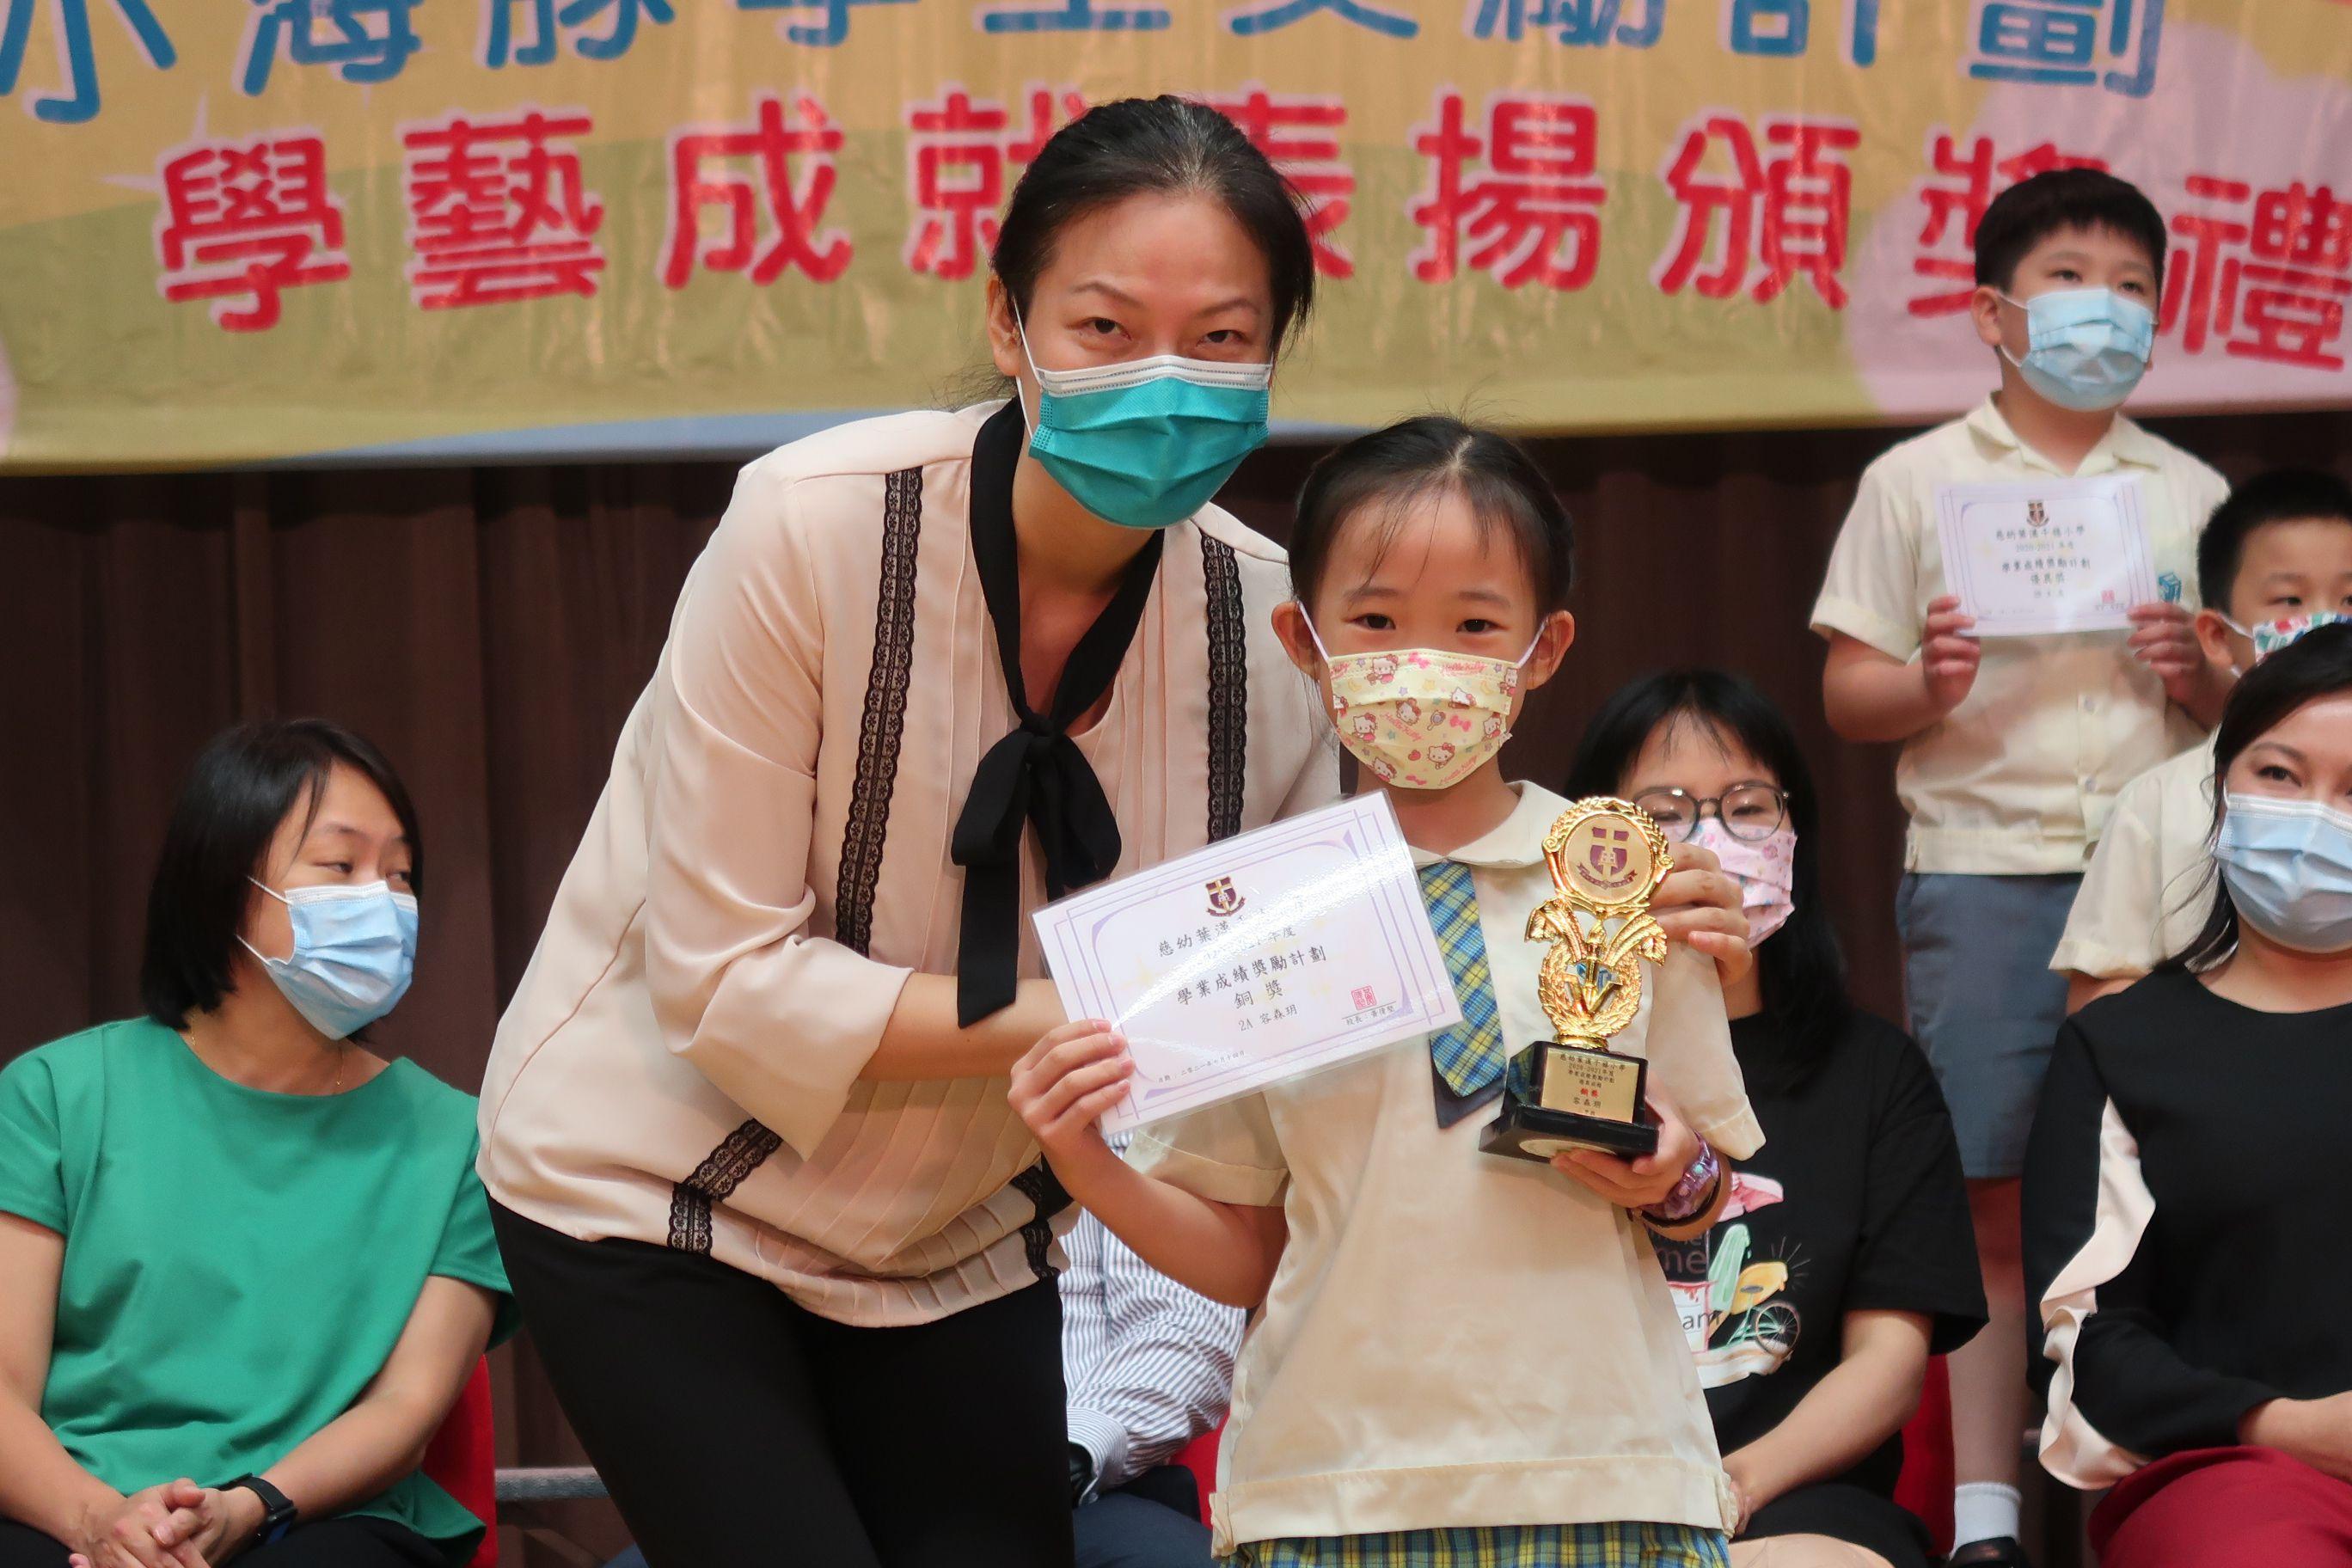 https://syh.edu.hk/sites/default/files/img_5541.jpg